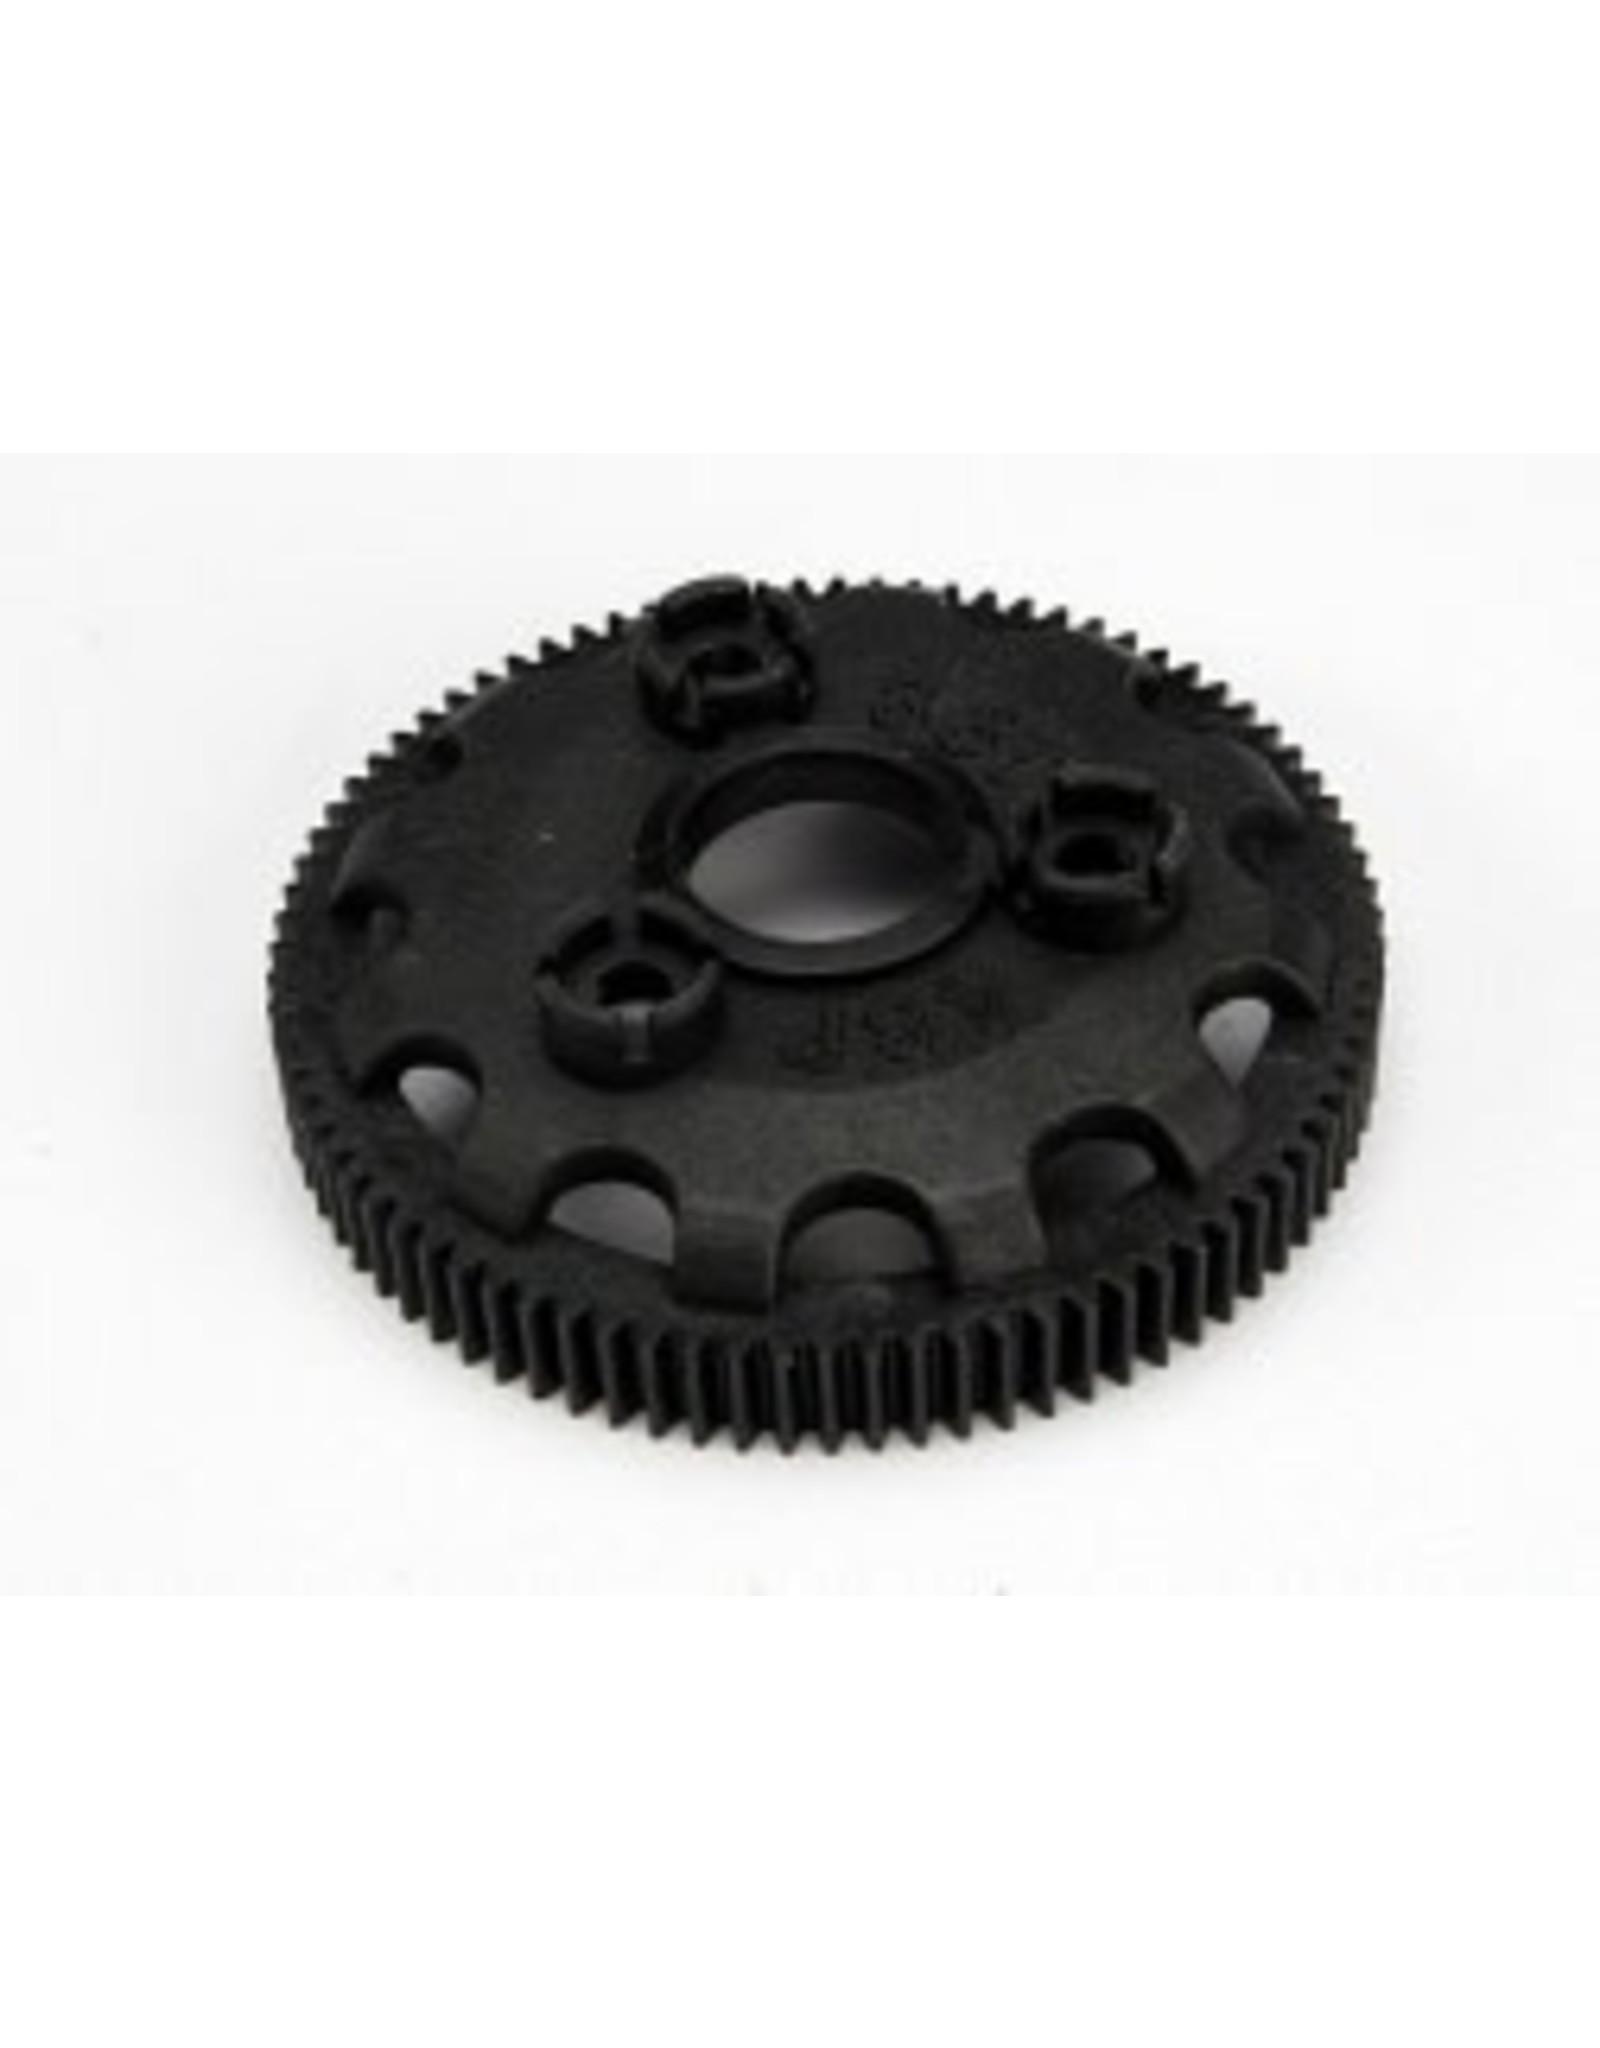 Traxxas 48P Spur Gear, 83T: Torque Slipper Clutch  (4683)